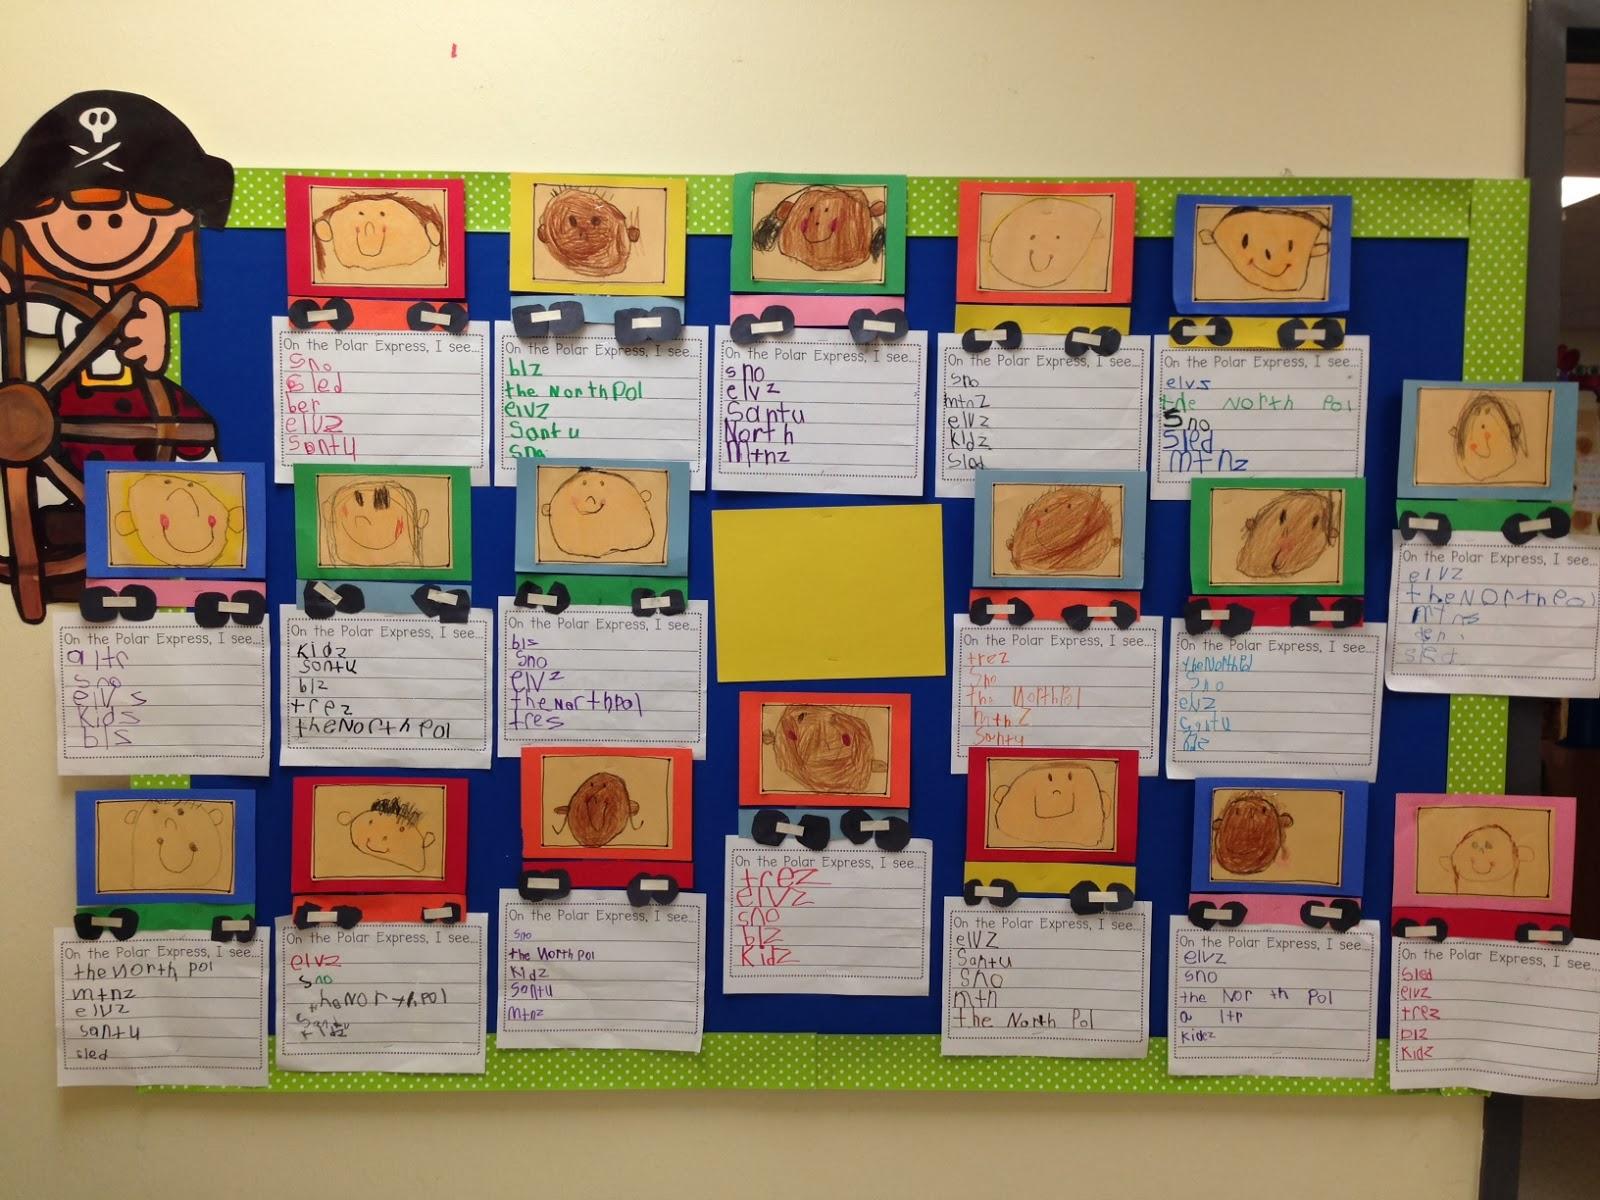 instructional materials used in teaching kindergarten